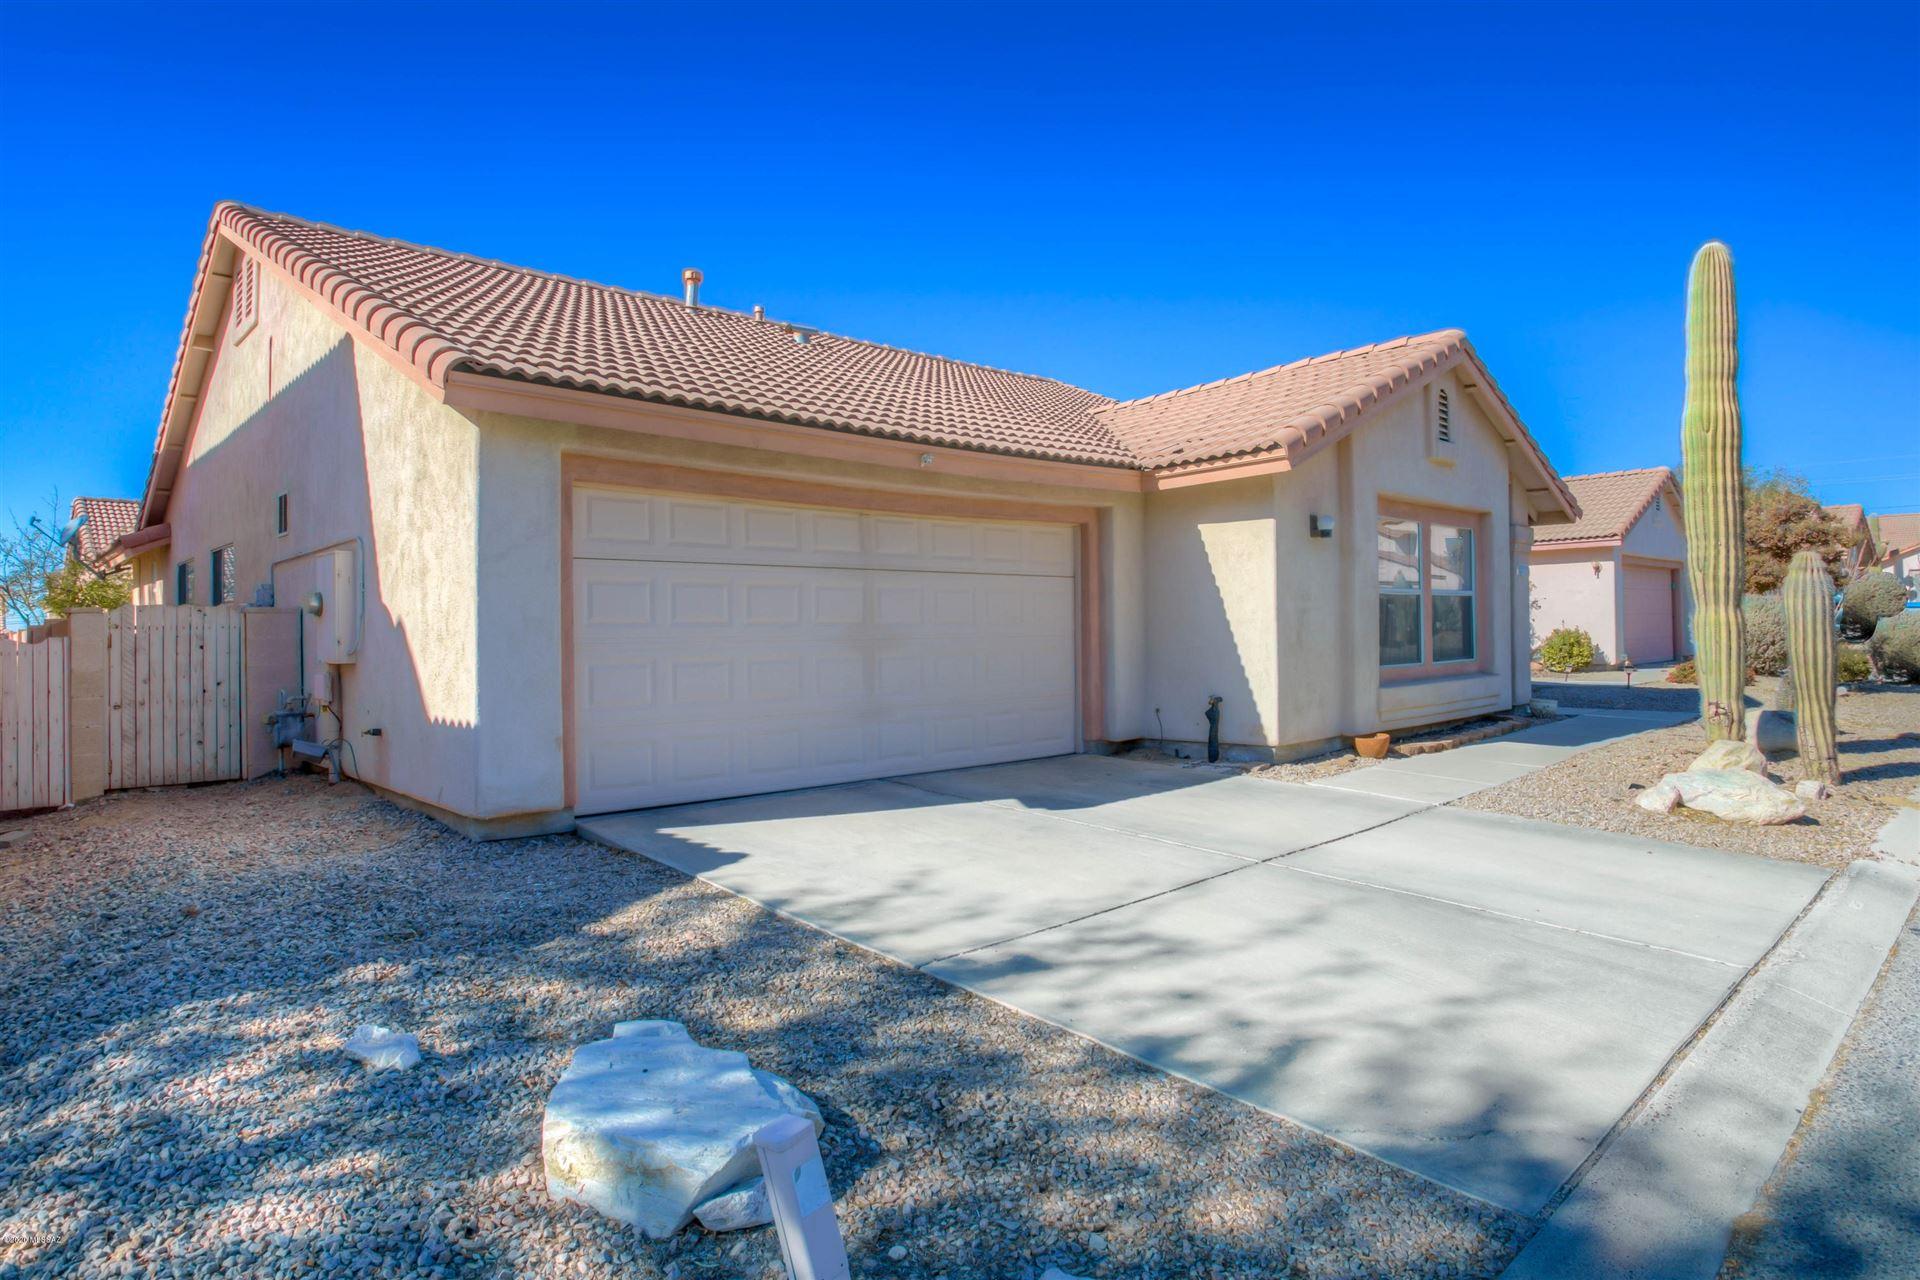 9961 N Outlaw Trail, Tucson, AZ 85742 - #: 22030243